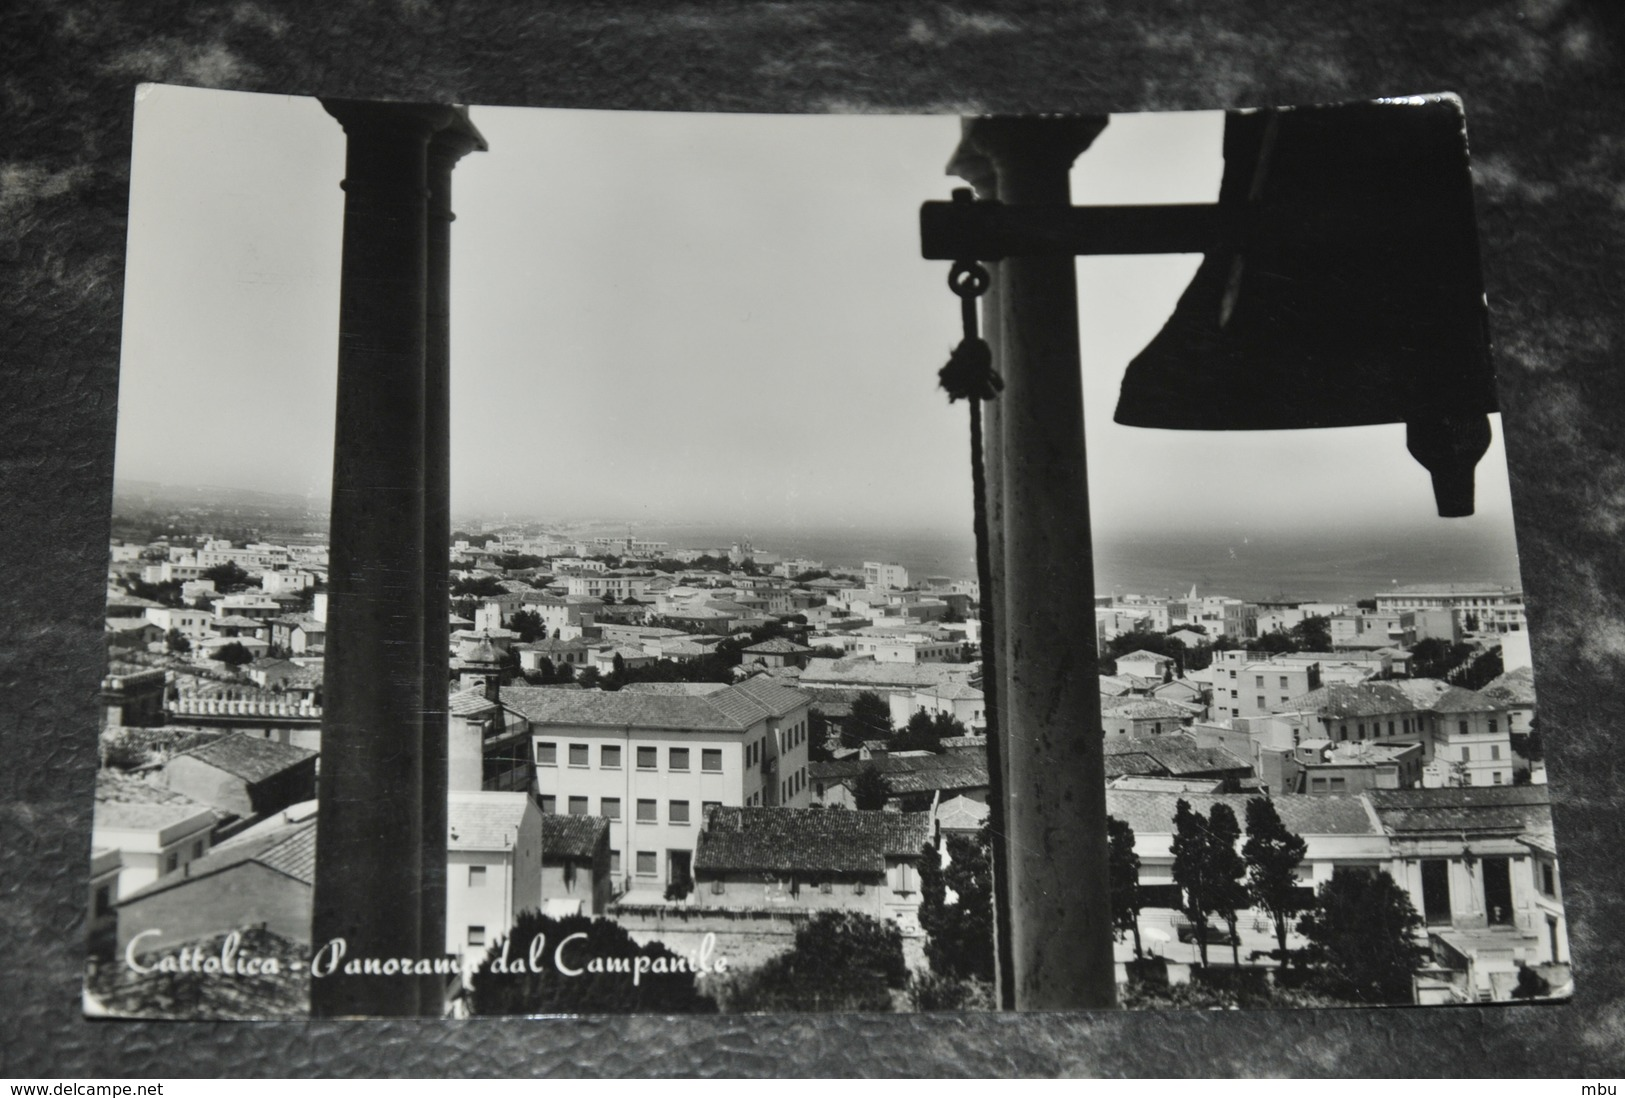 3369   CATTOLICA - Panorama Dal Campanile - Italie